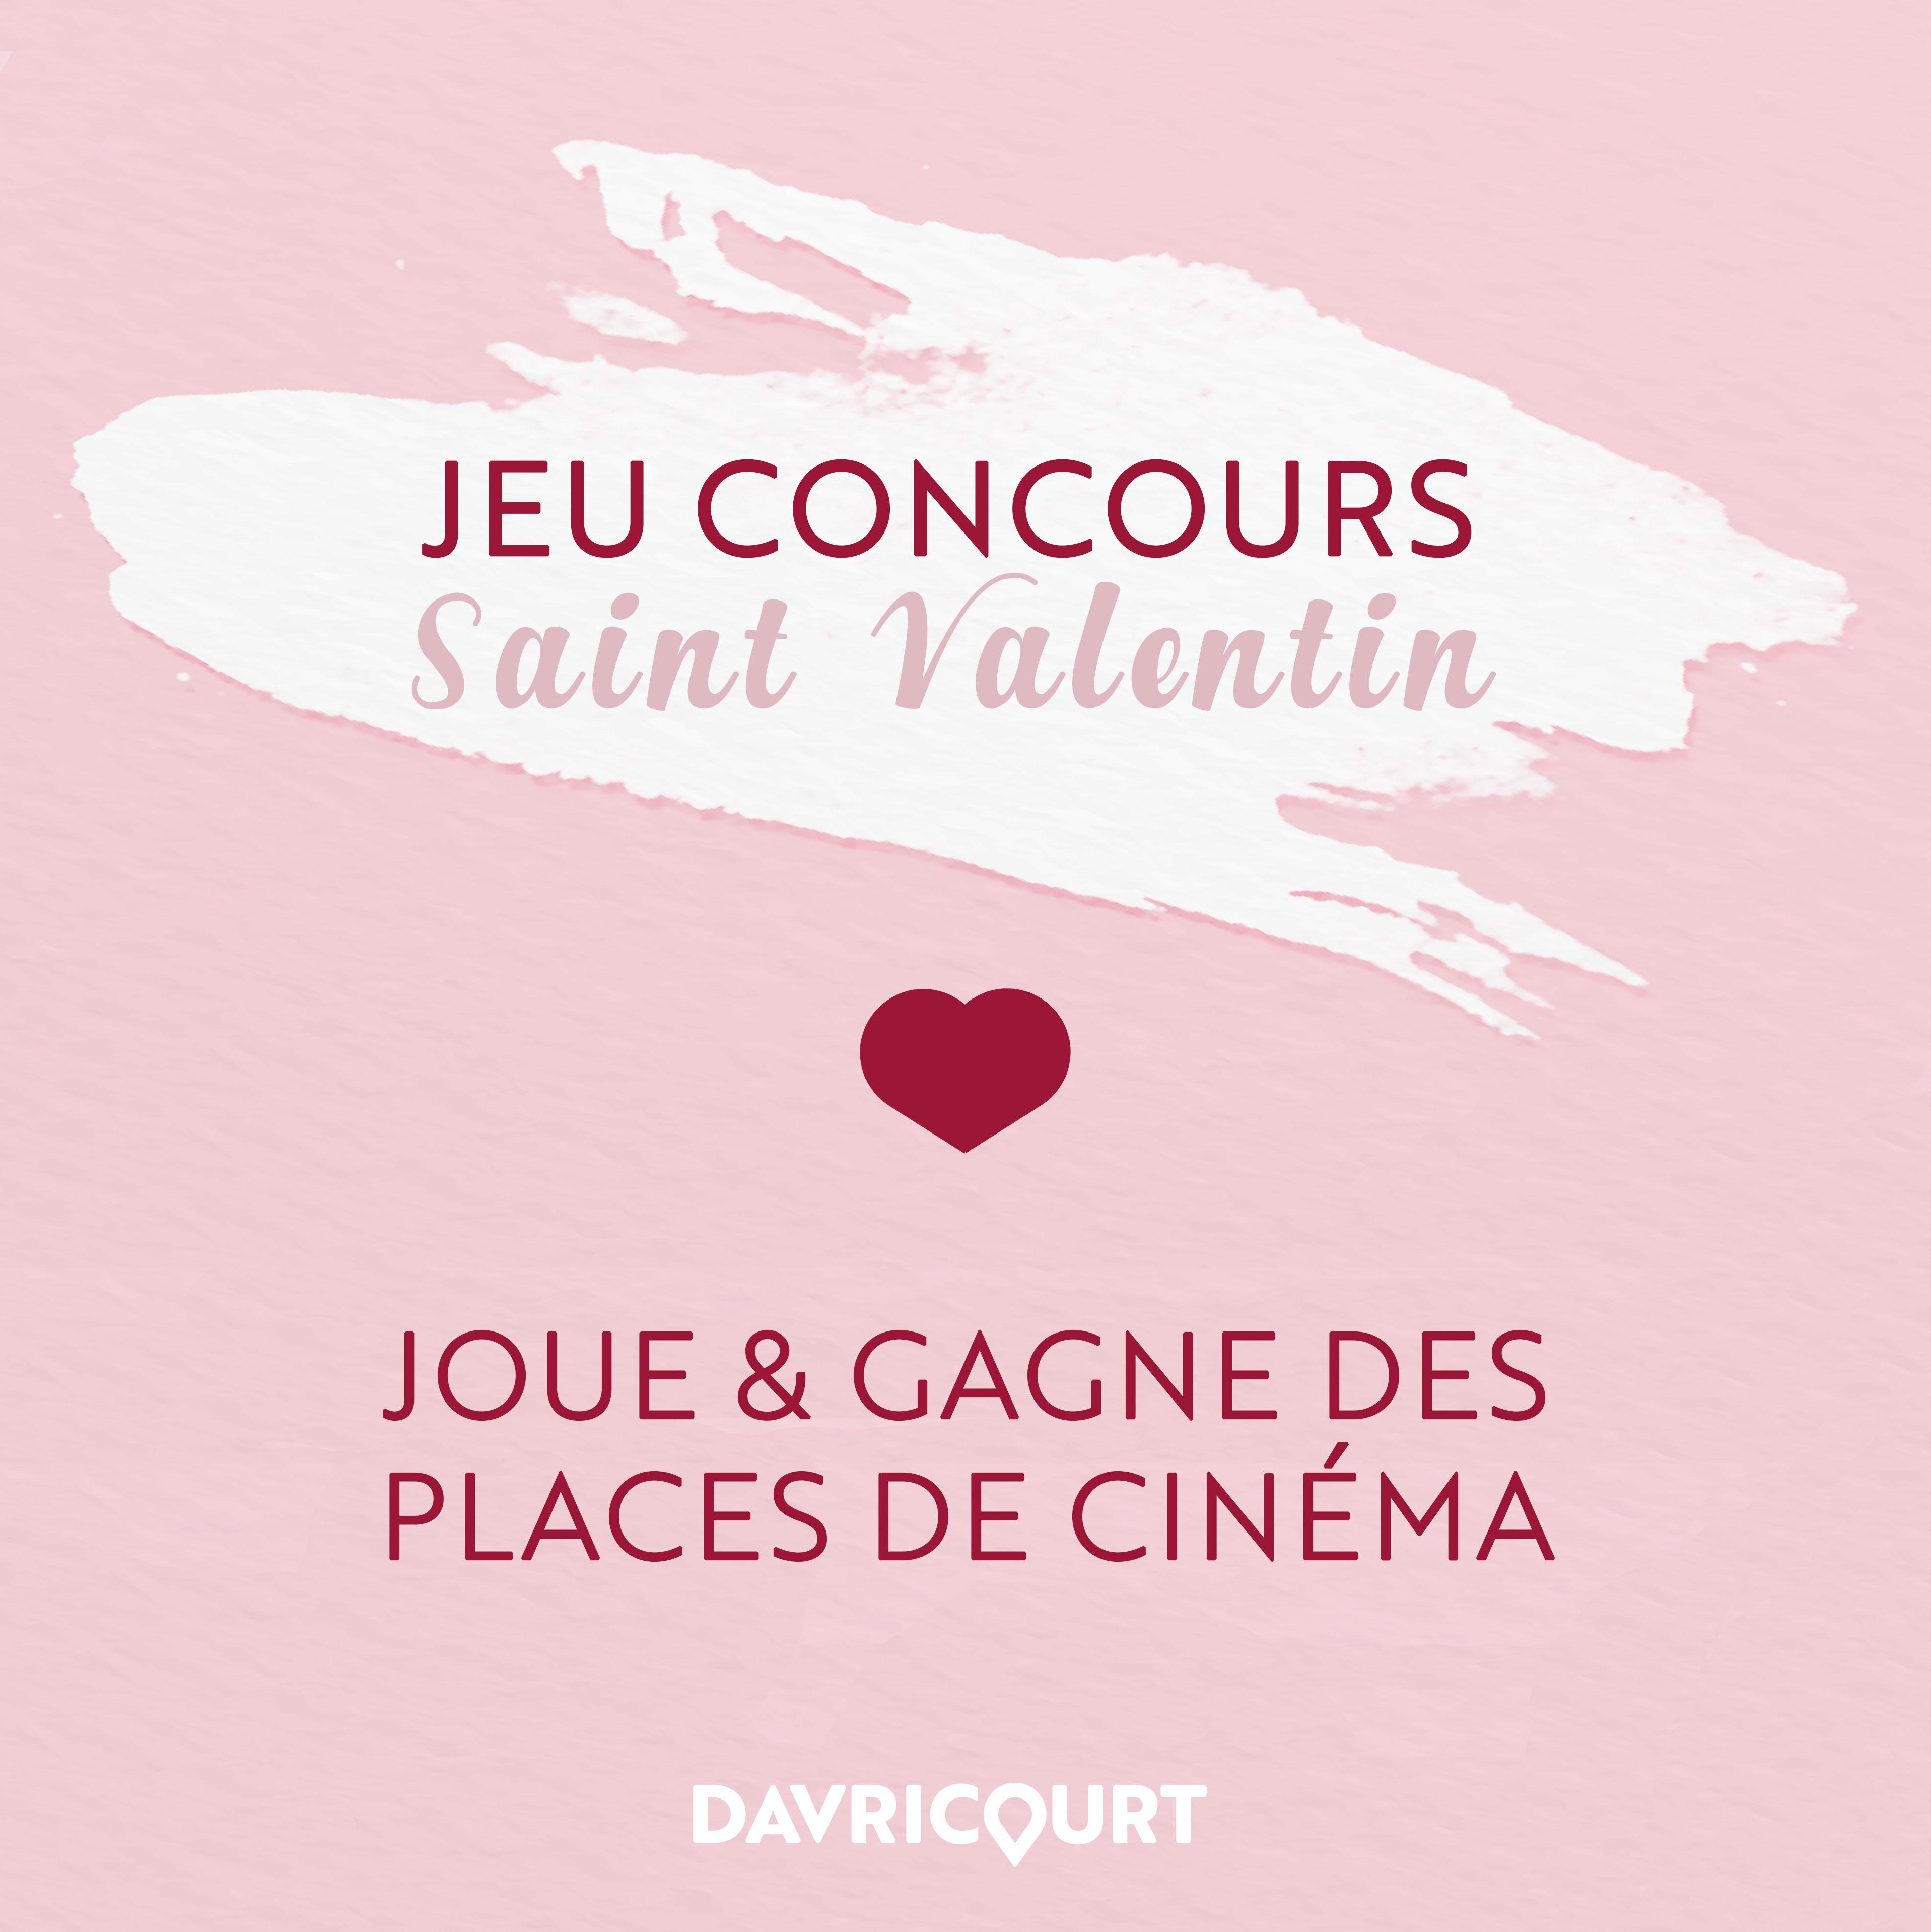 jeu-concours-st-valentin-cinema